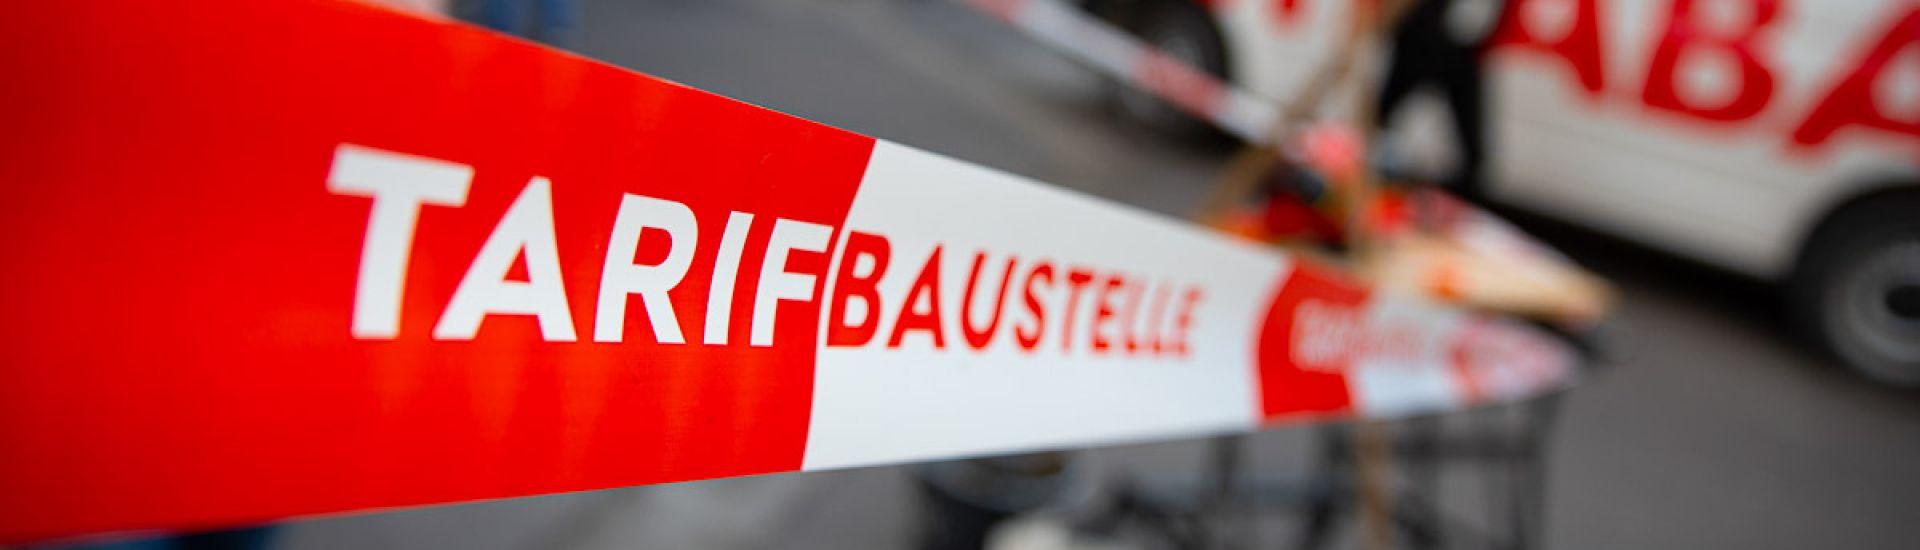 Tarifbaustelle: Aktion für Tarifbindung in Karlsruhe (Foto: DGB/Tim M. Carmele)